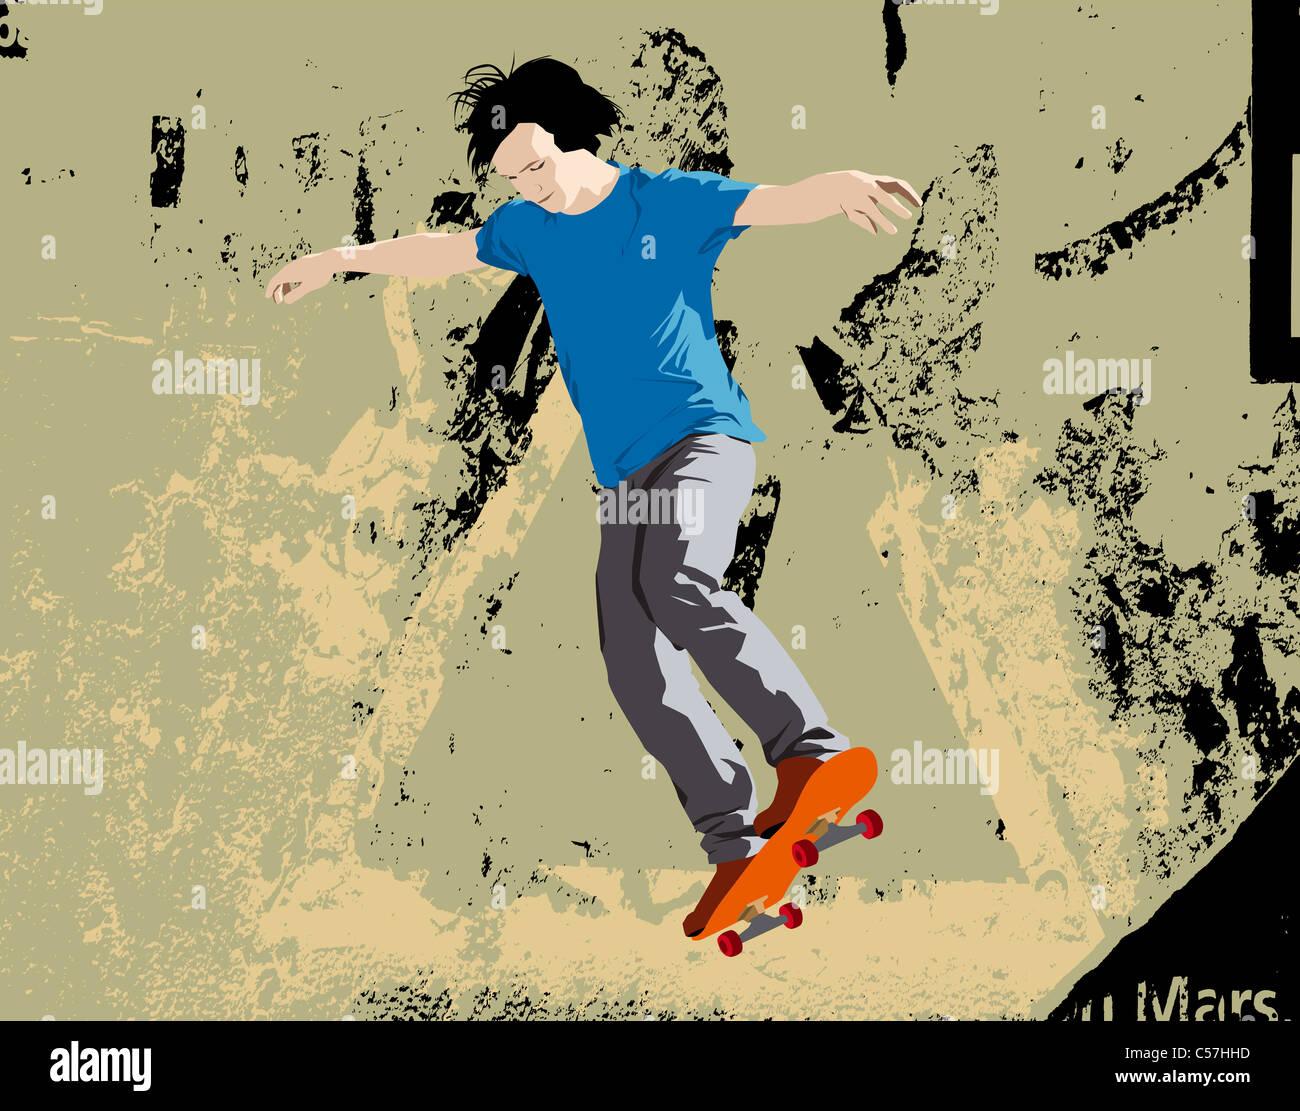 Junge Skater springen. Vektor-Illustration mit Grunge Hintergrund. Stockbild